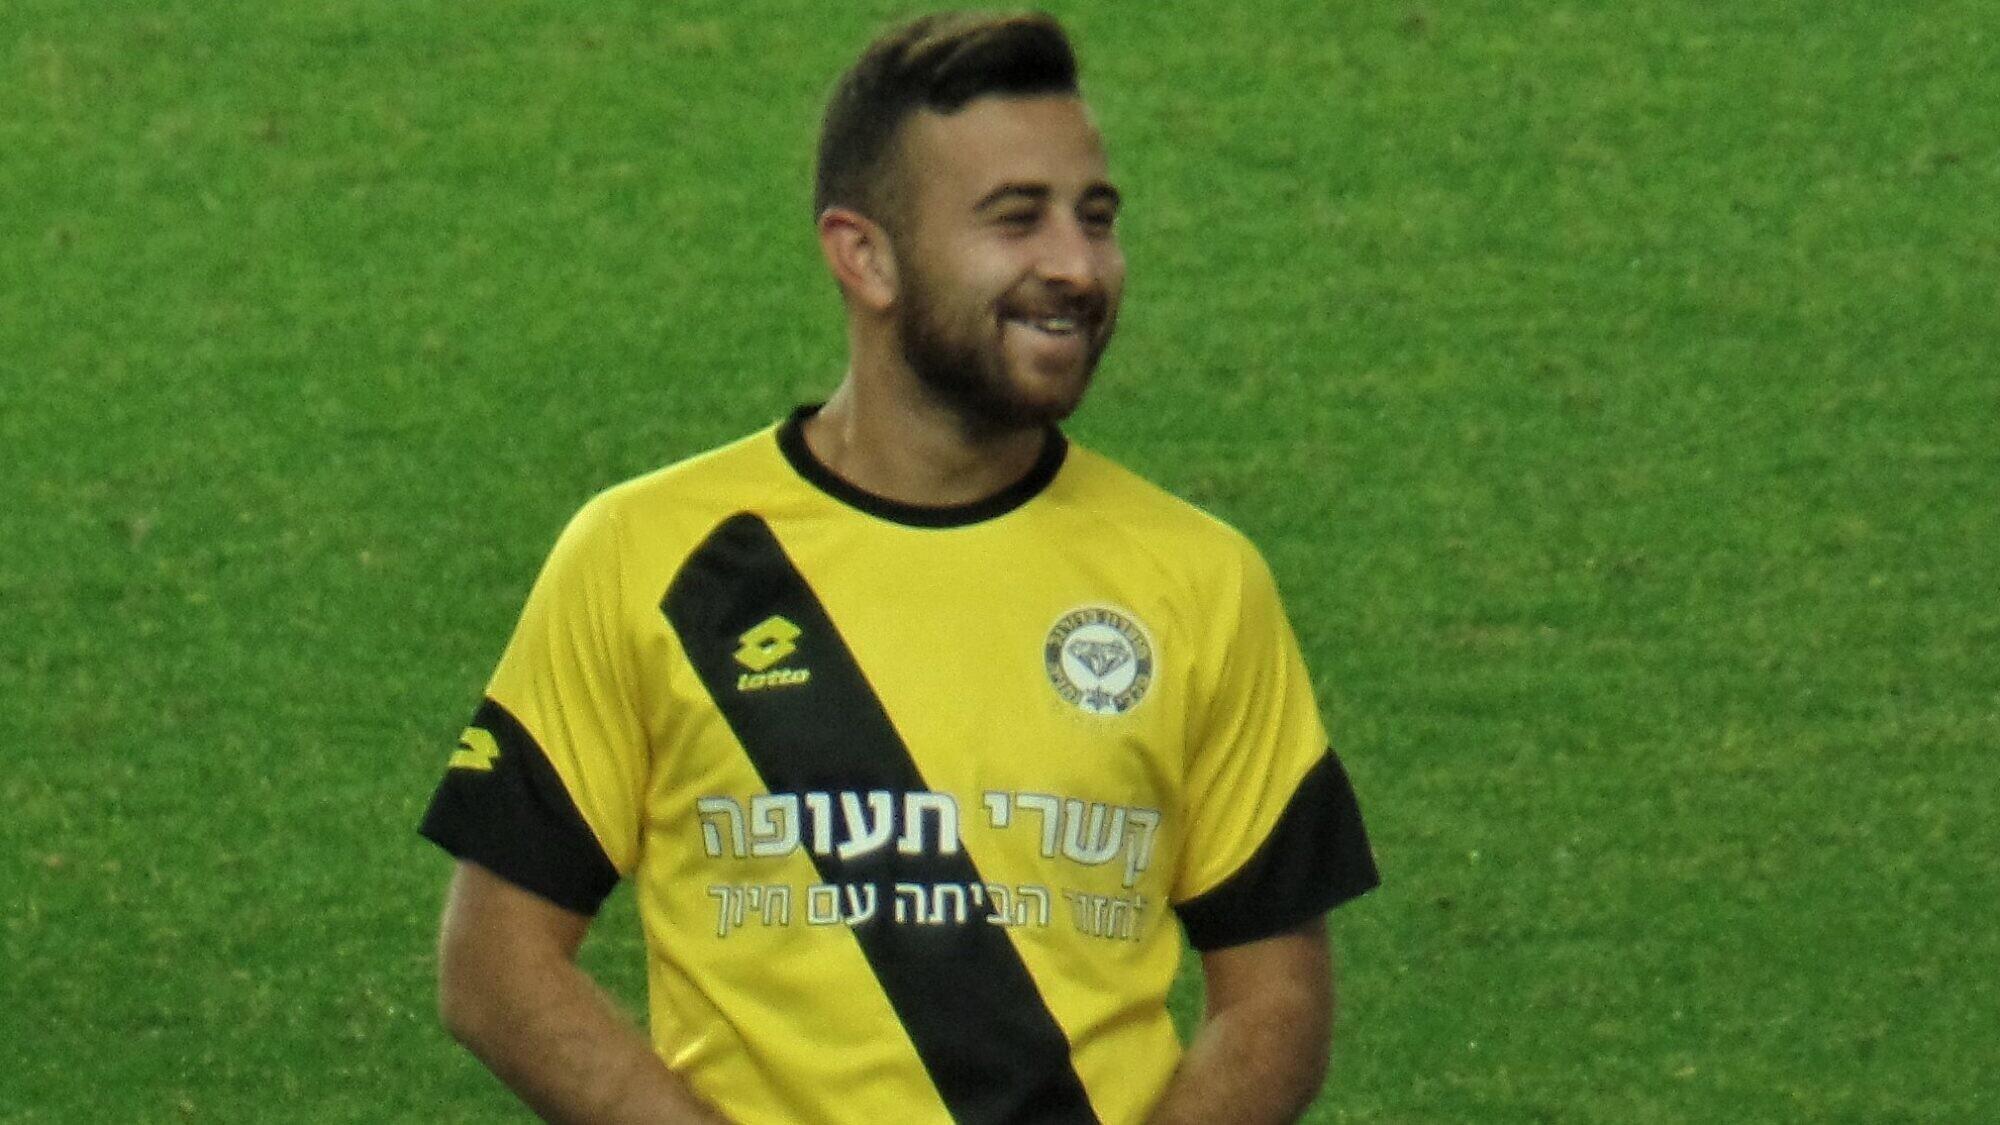 Football : Un joueur israélien proche du championnatdes Émirats arabes unis